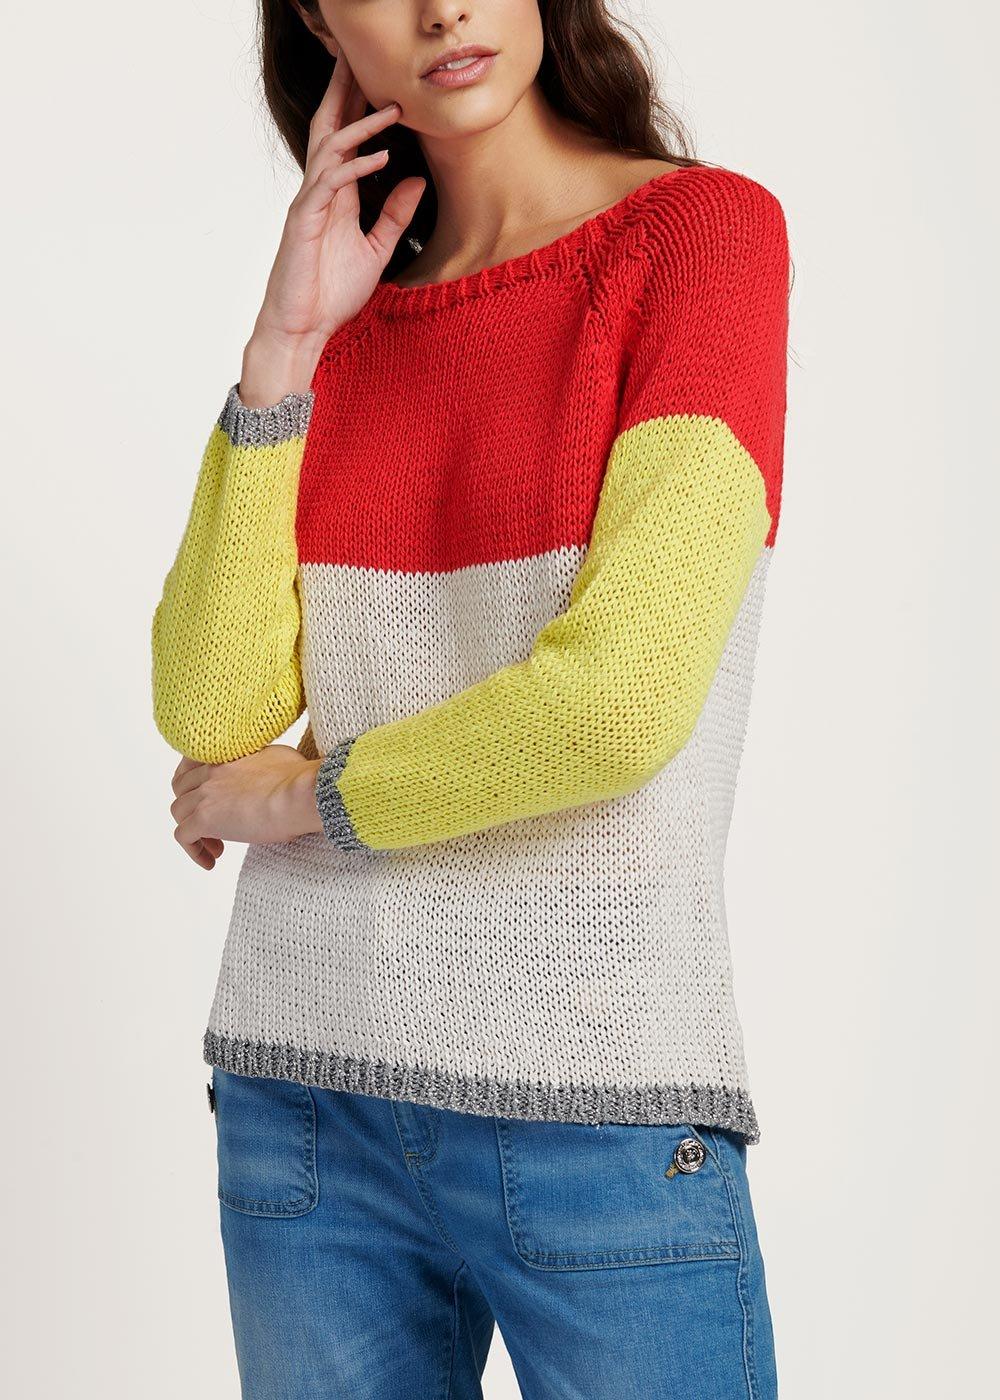 Two-tone cotton and viscose Madlen sweater - Aragosta / Light Beige/lurex - Woman